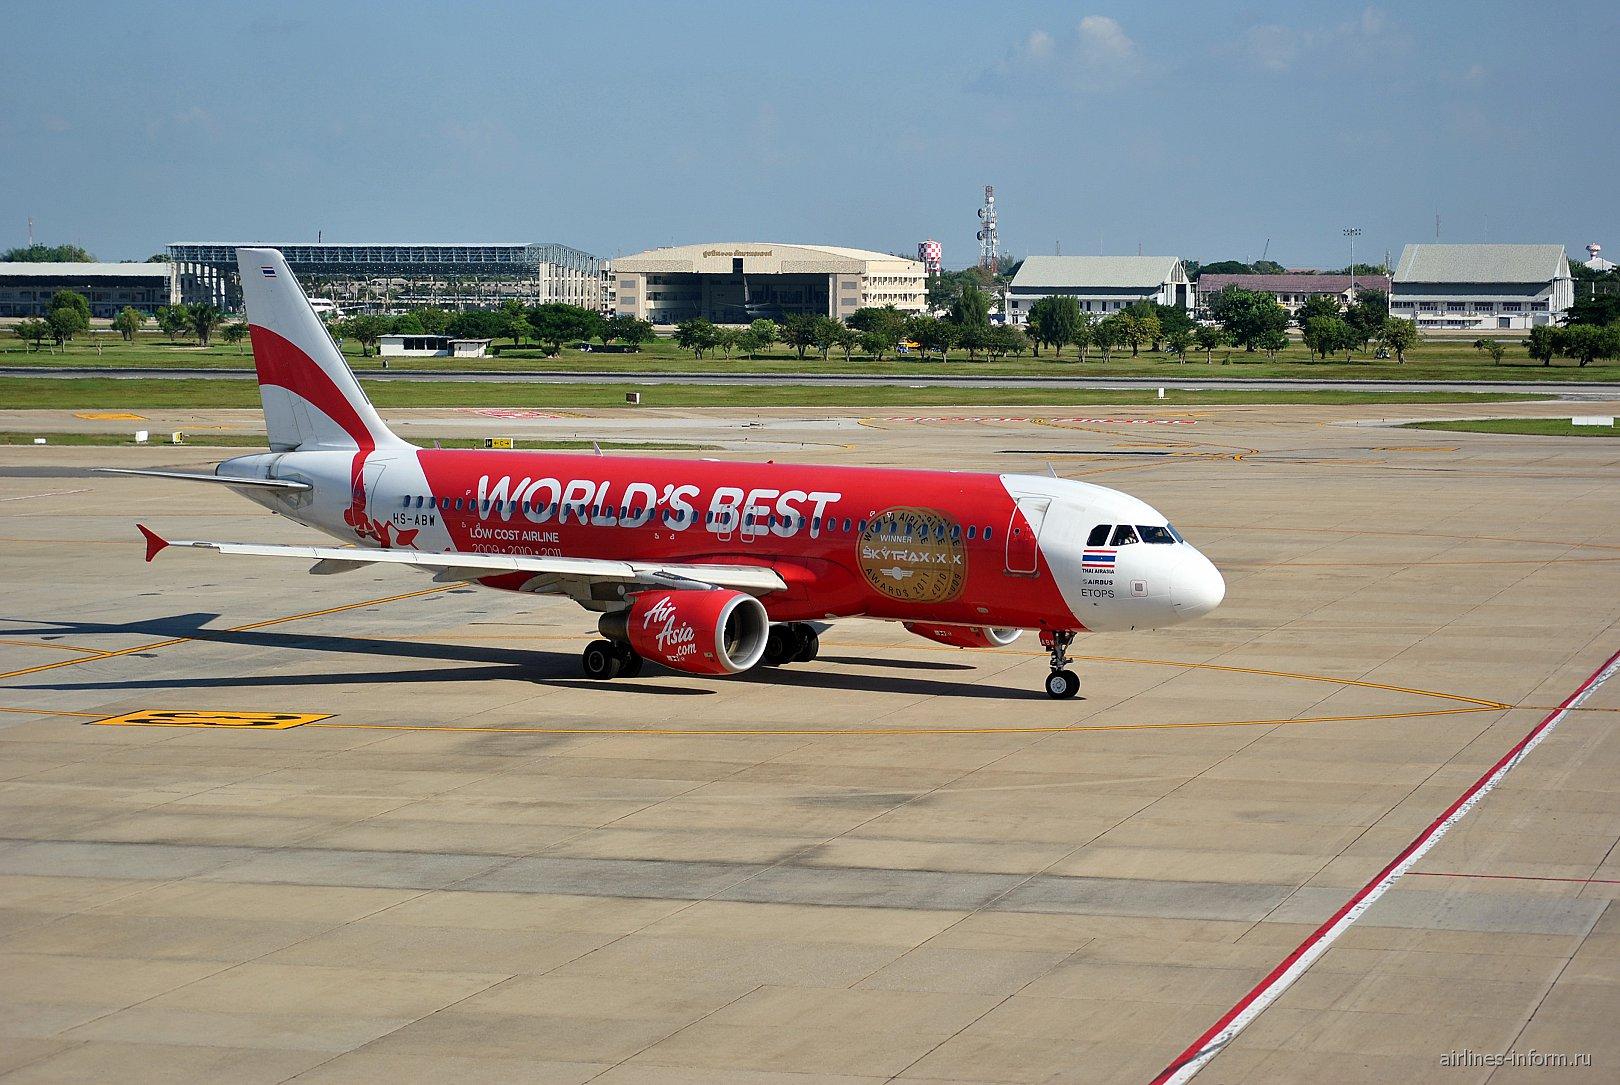 Airbus A320 HS-ABW авиакомпании Thai AirAsia в аэропорту Бангкок Дон Муанг